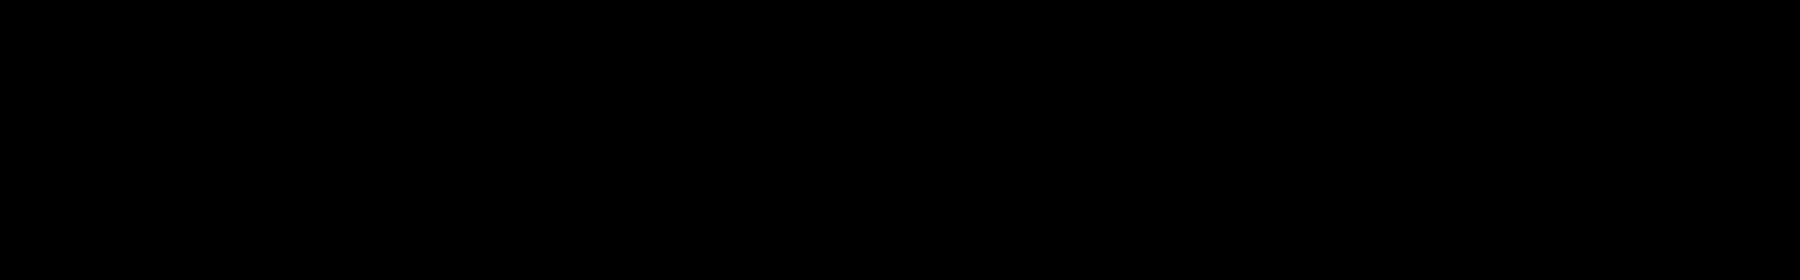 The Drill audio waveform